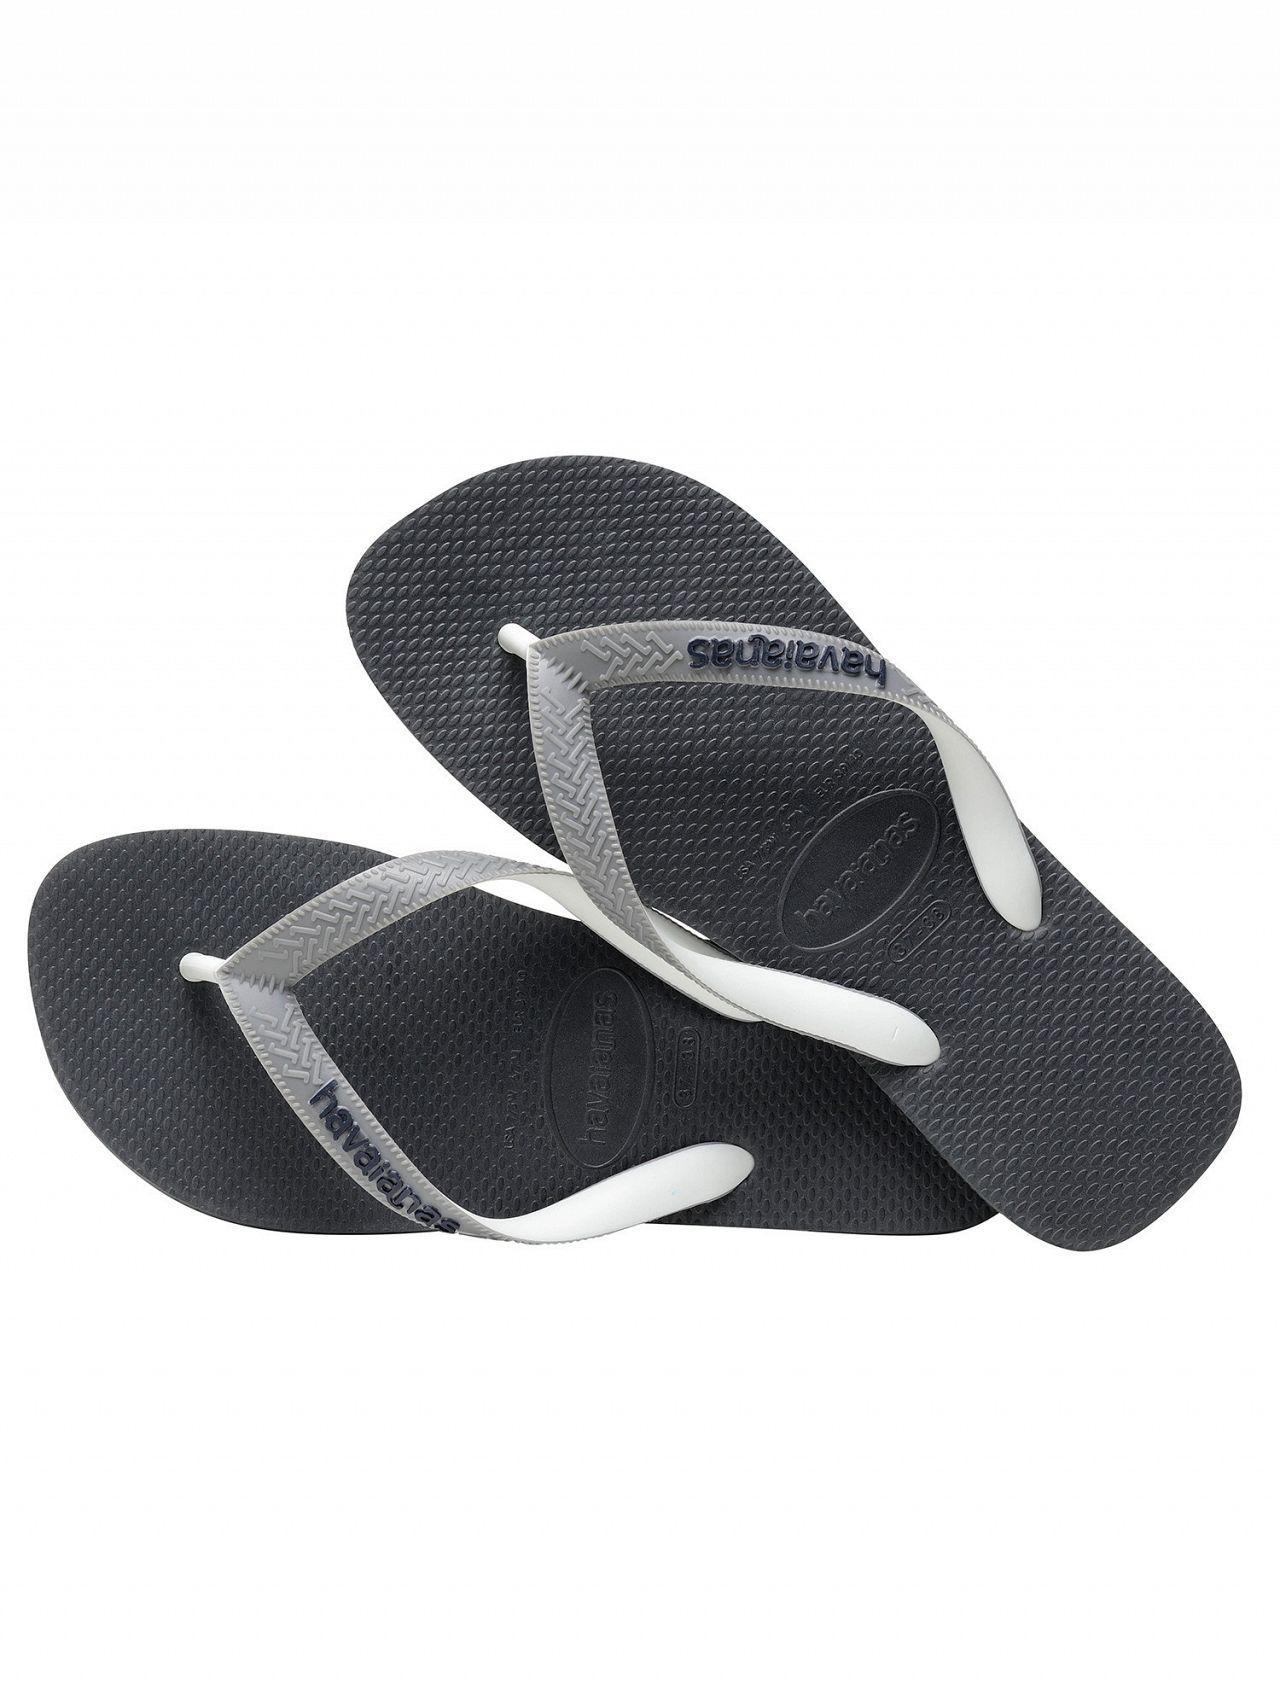 cfc2c1341 Havaianas - Gray Graphite Grey Top Mix Flip Flops for Men - Lyst. View  fullscreen